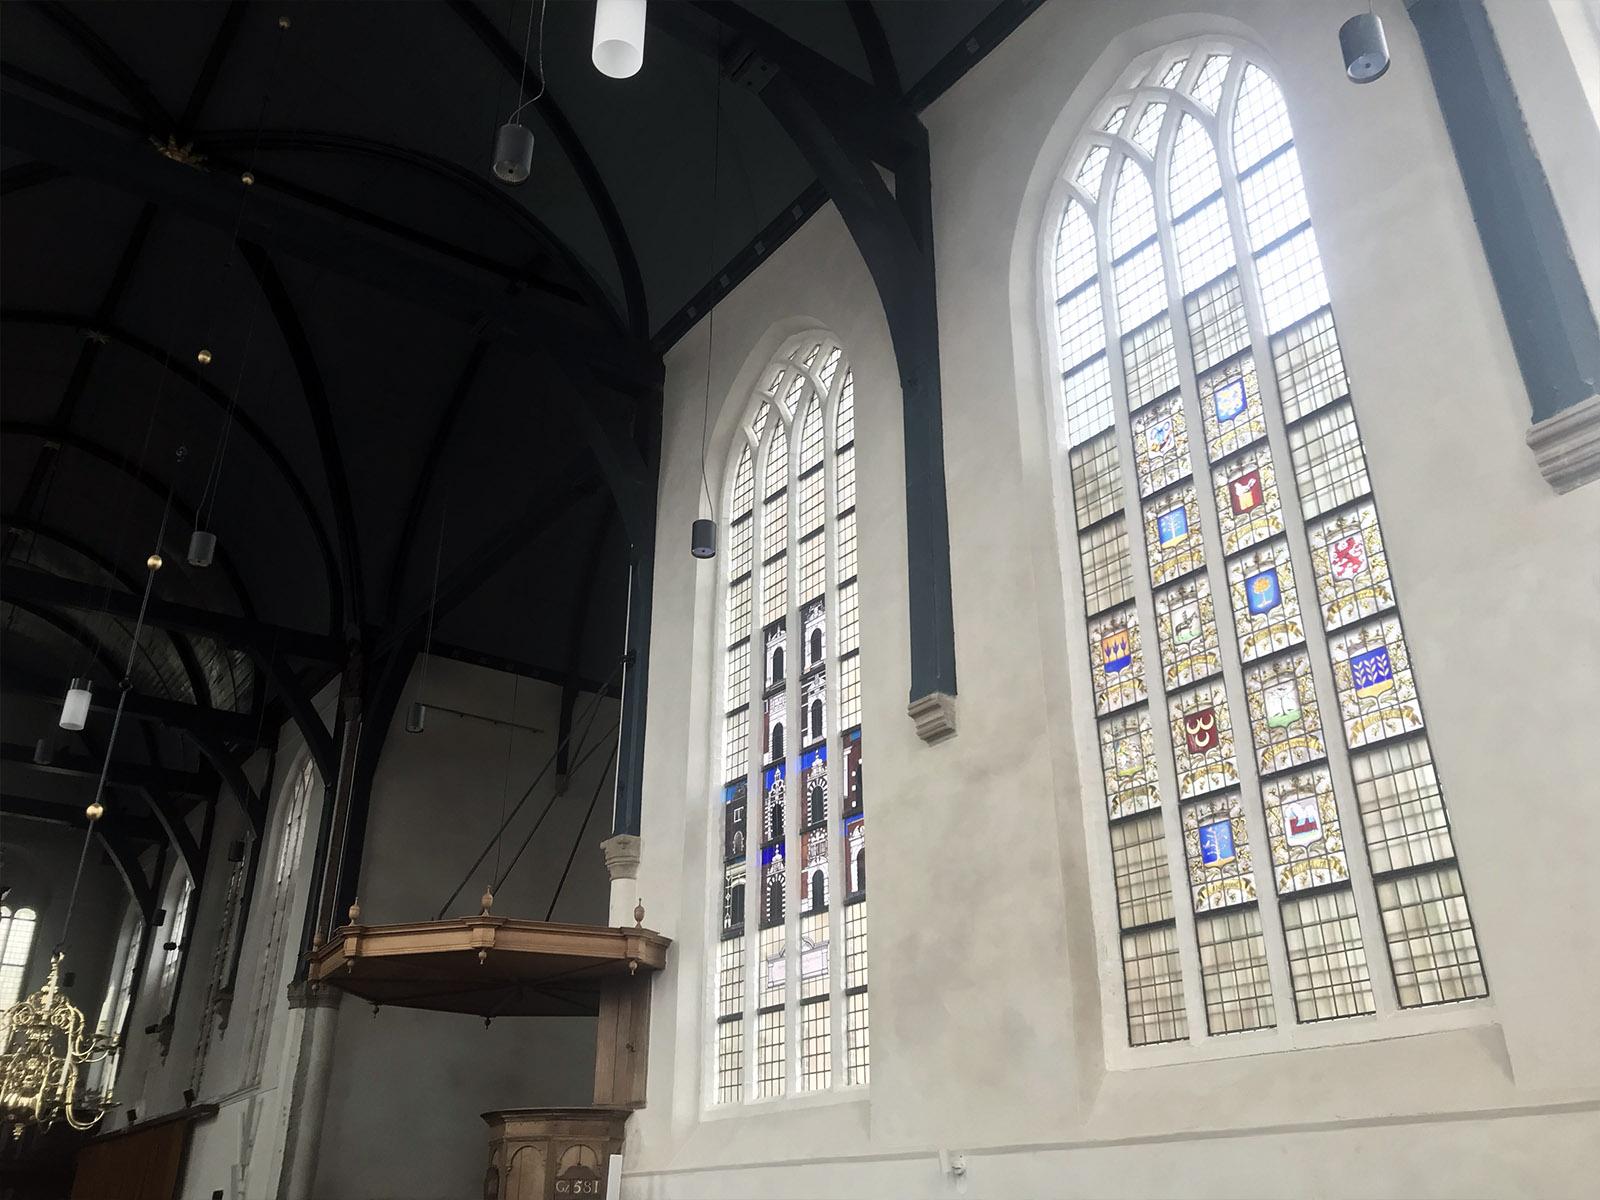 kerk mortel zoutuitbloei